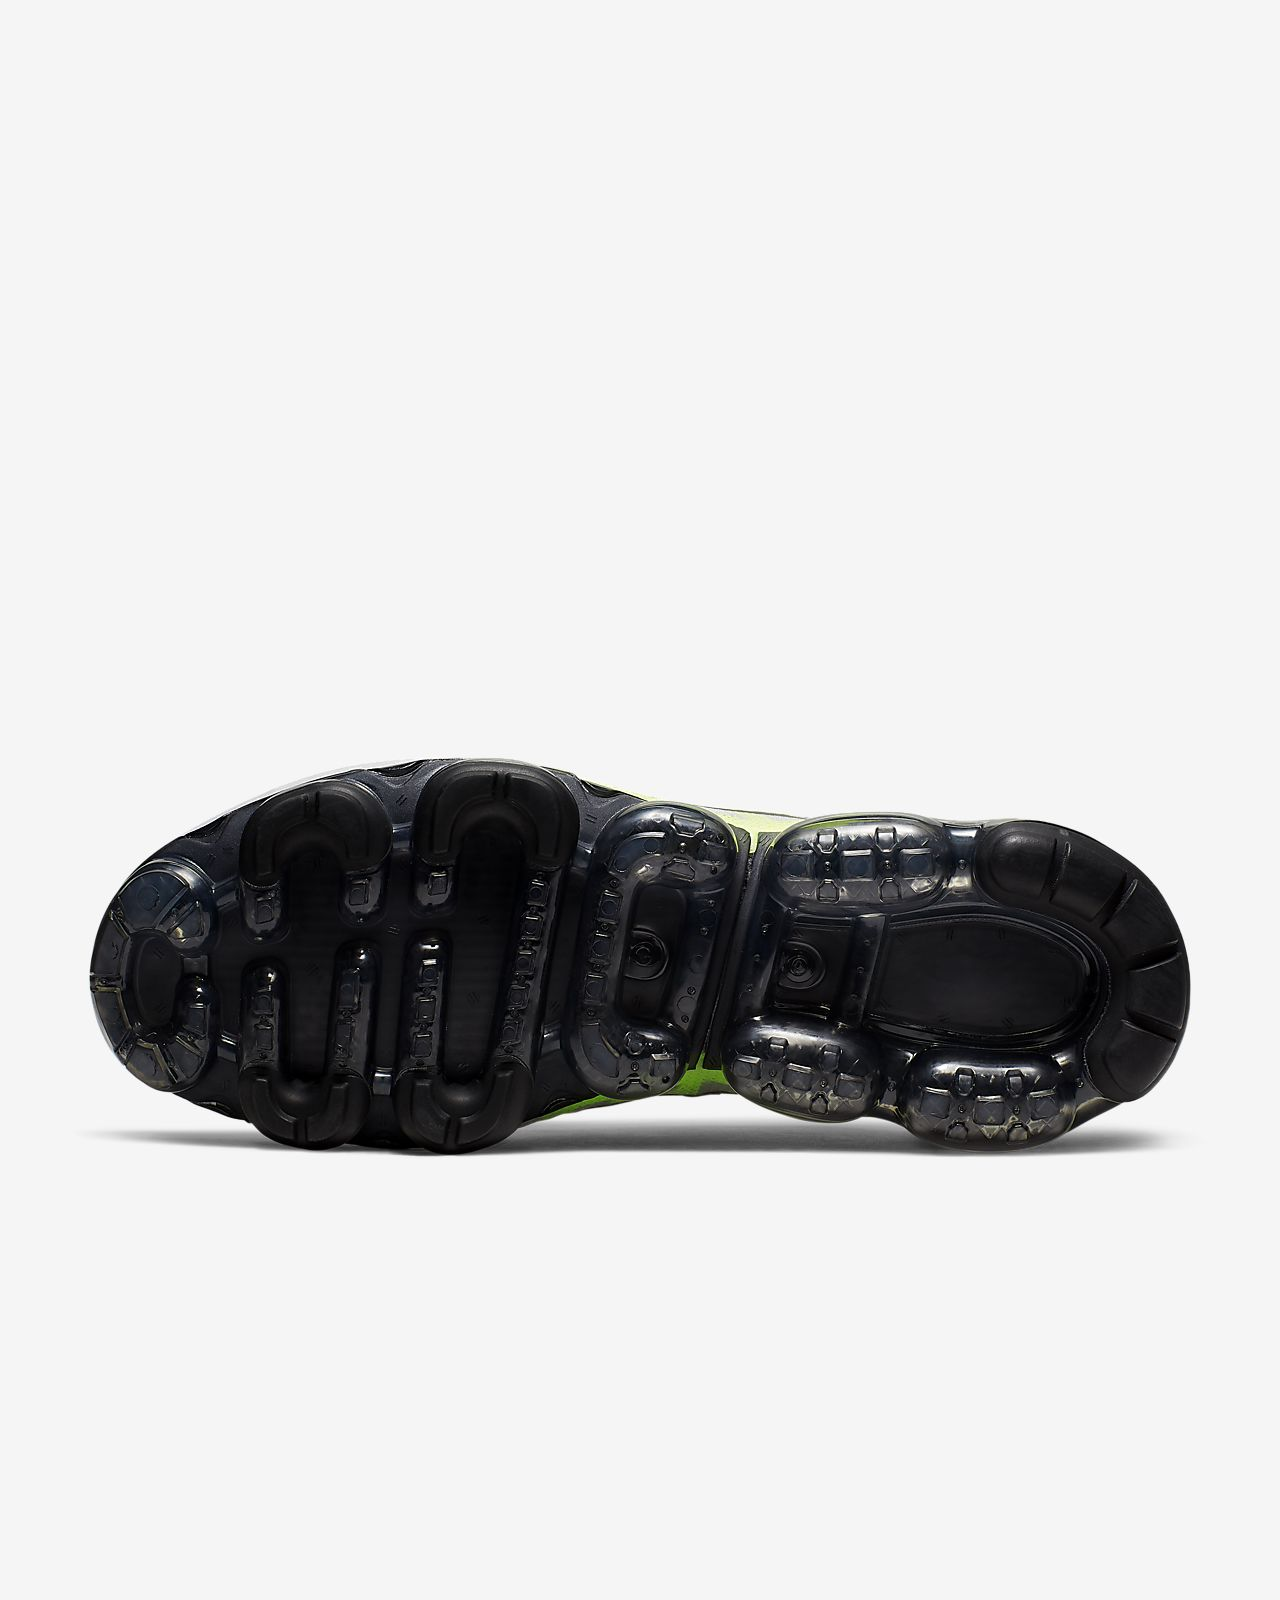 be86fb56b5 Nike Air VaporMax LX Men's Shoe